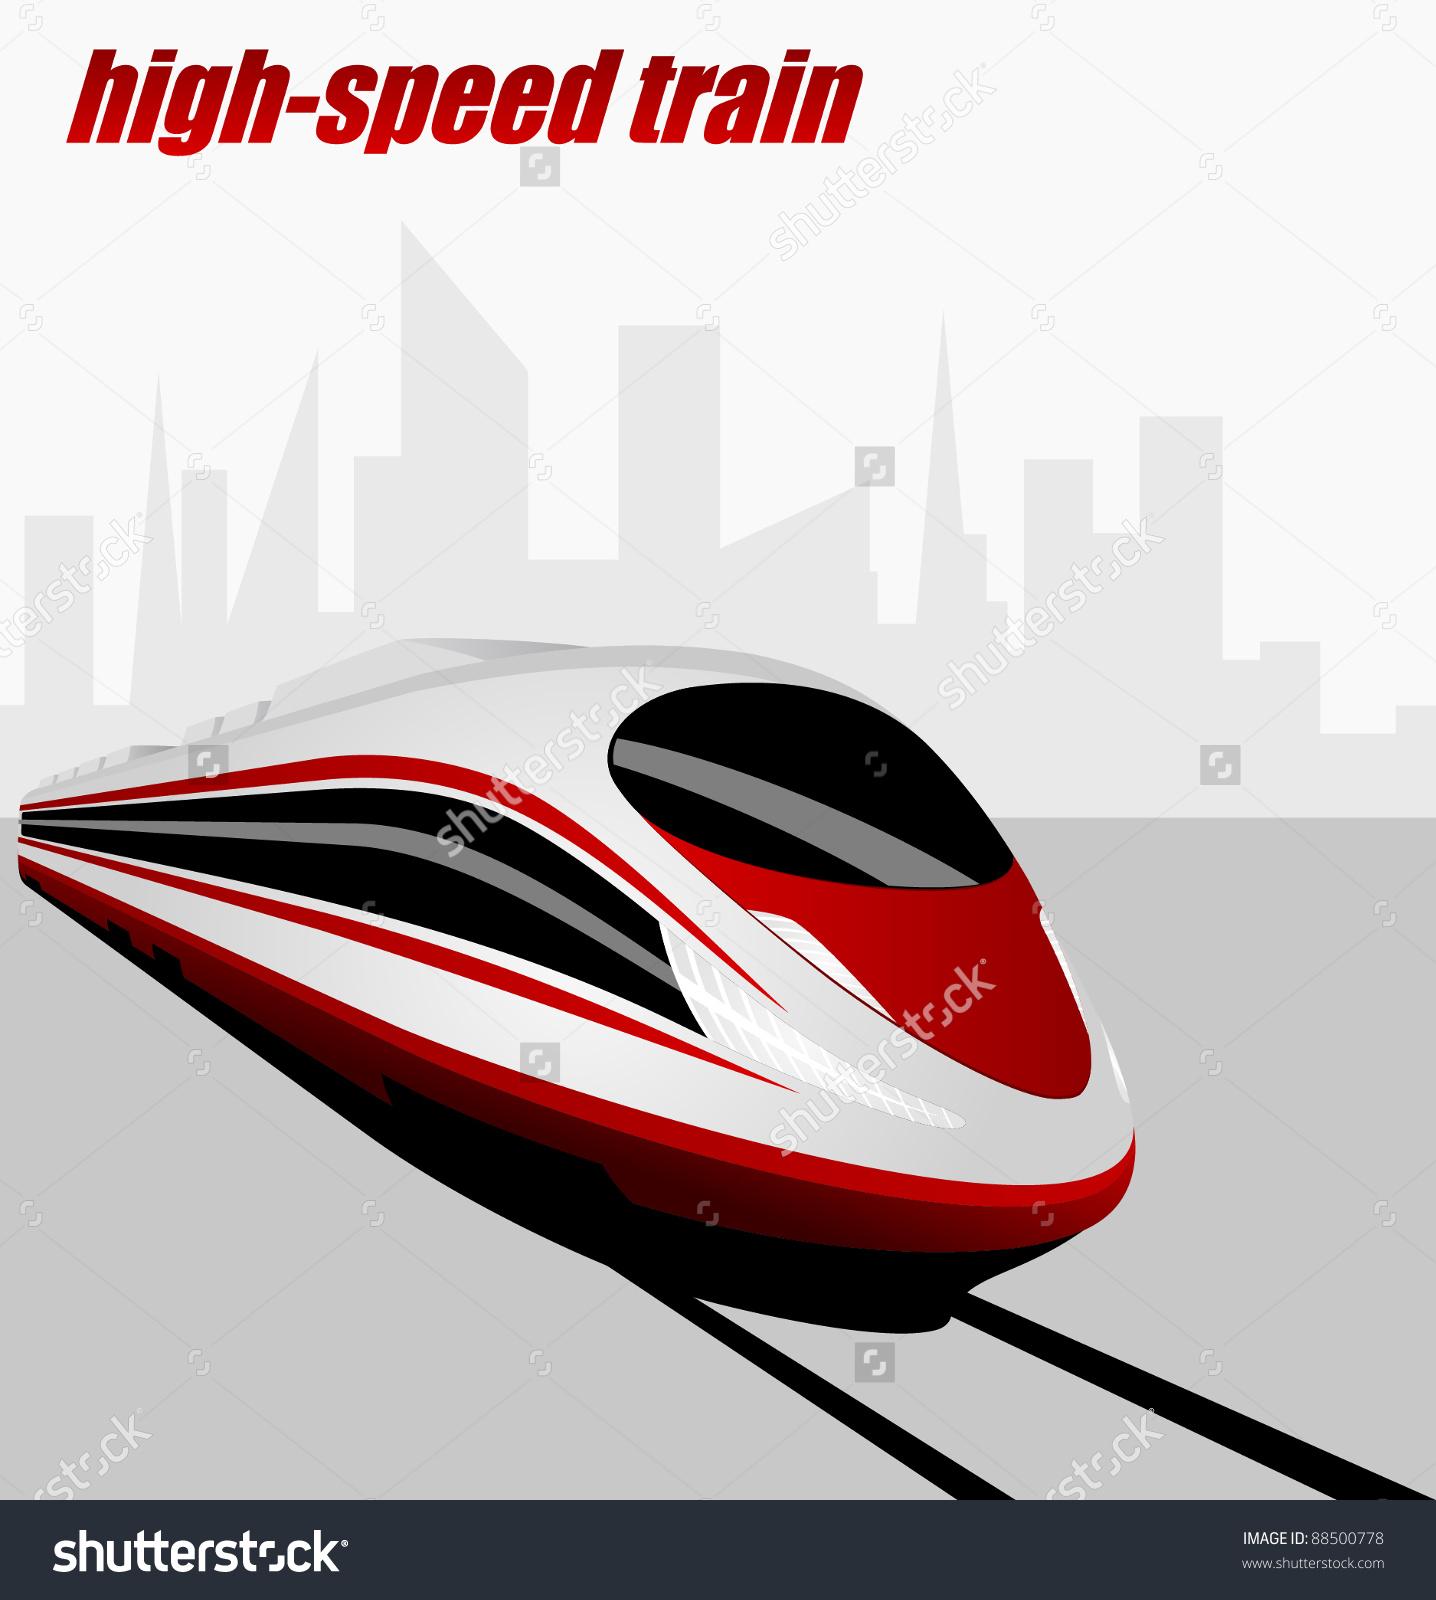 Modern High Speed Train Stock Vector Illustration 88500778.